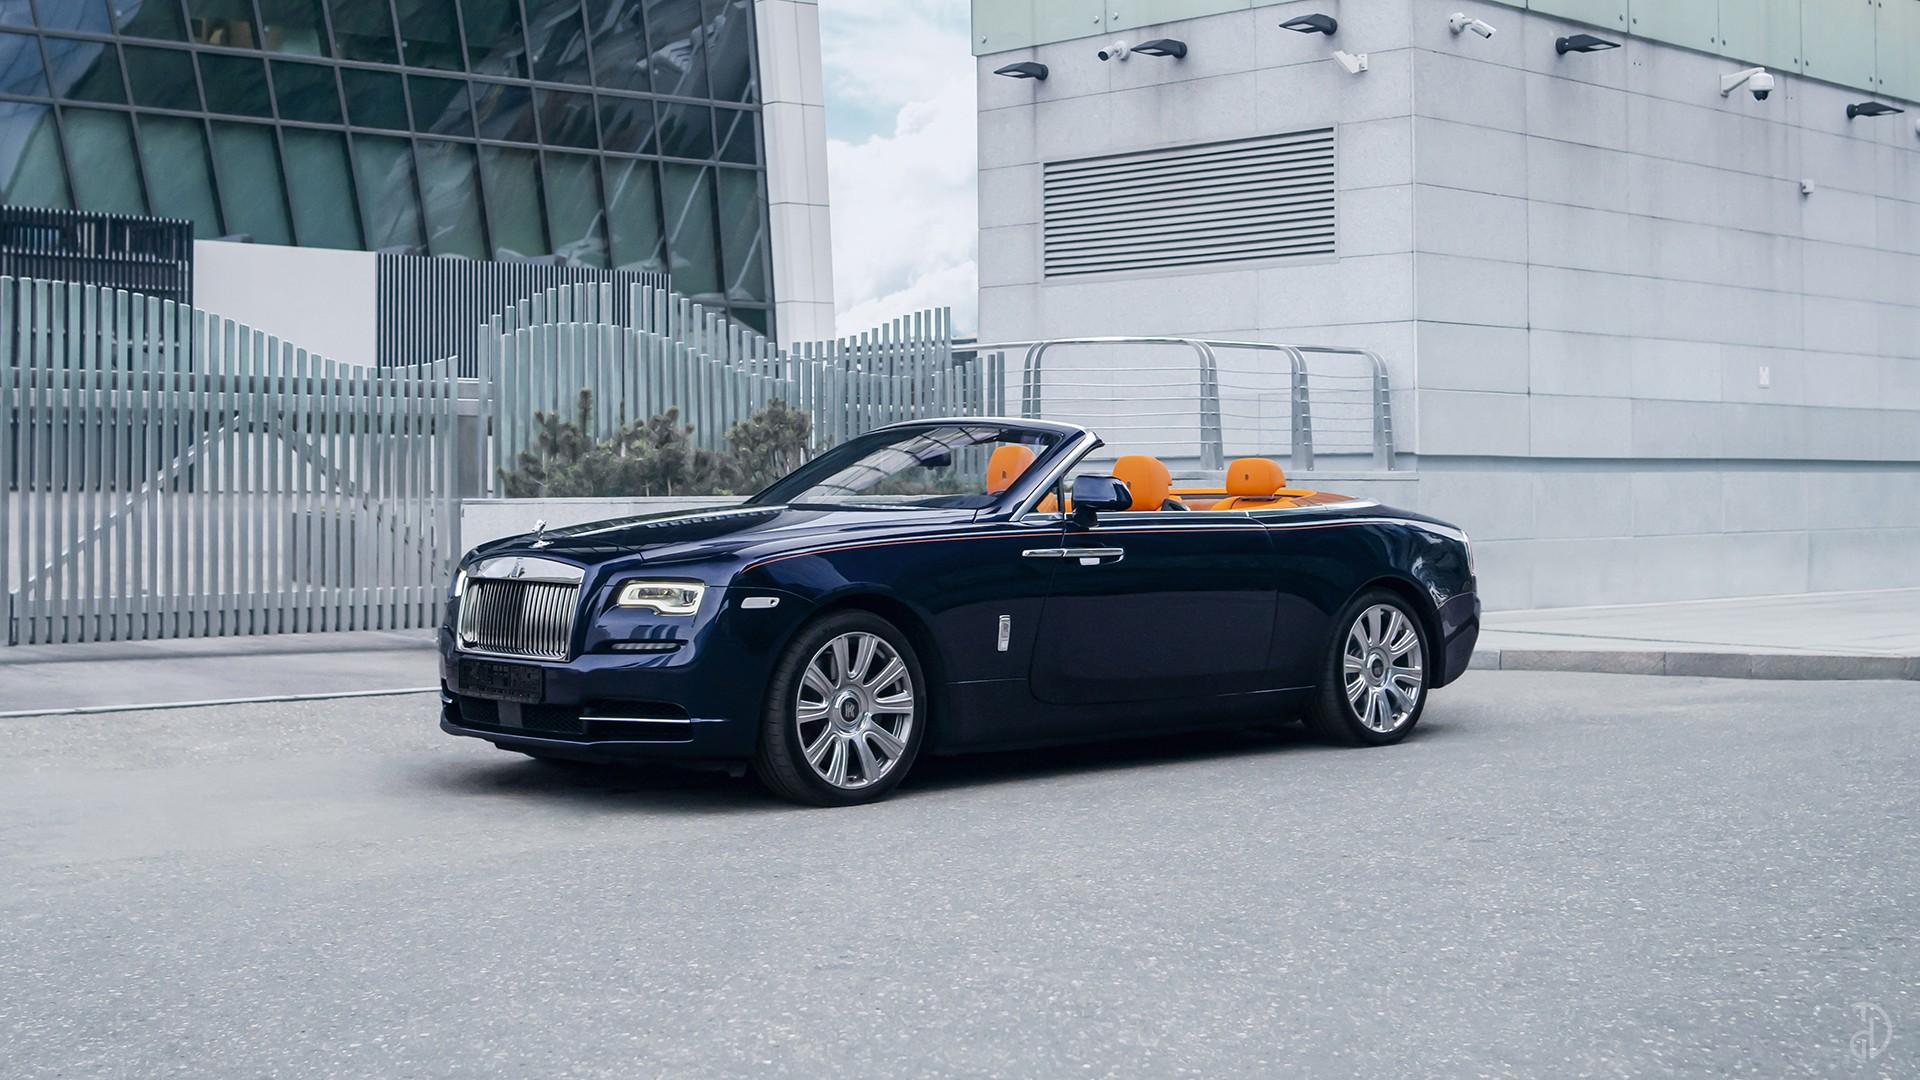 Аренда Rolls-Royce Dawn в Москве. Фото 2